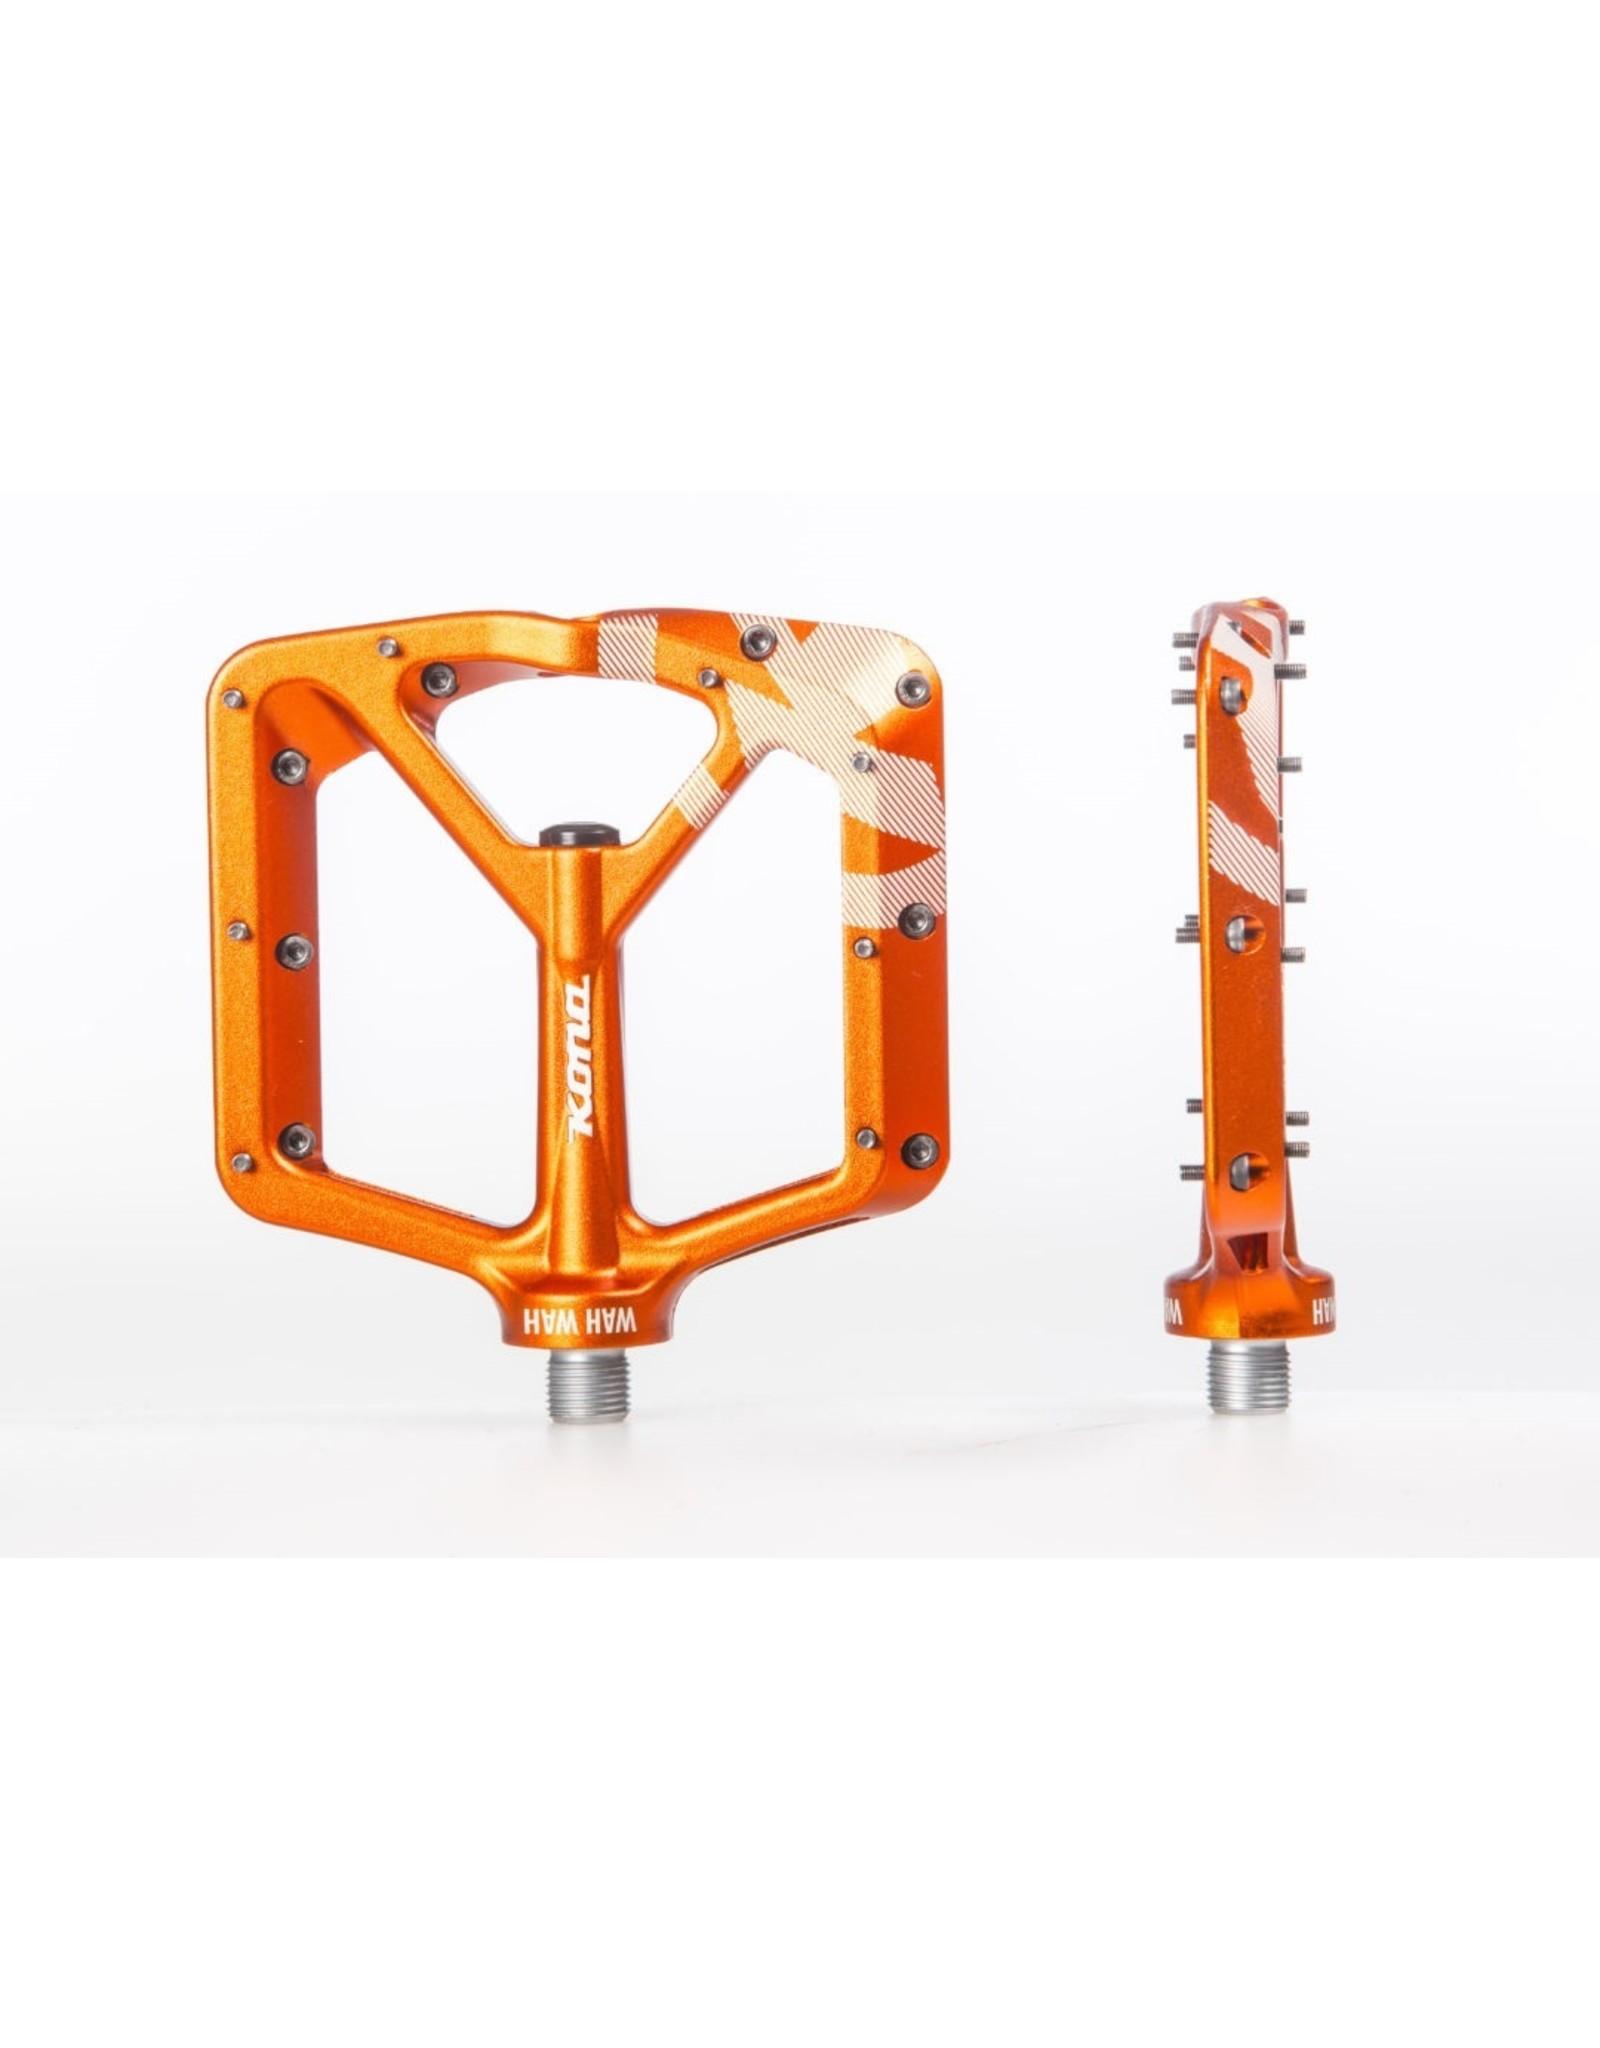 pedal kona wah wah 2 alloy orange